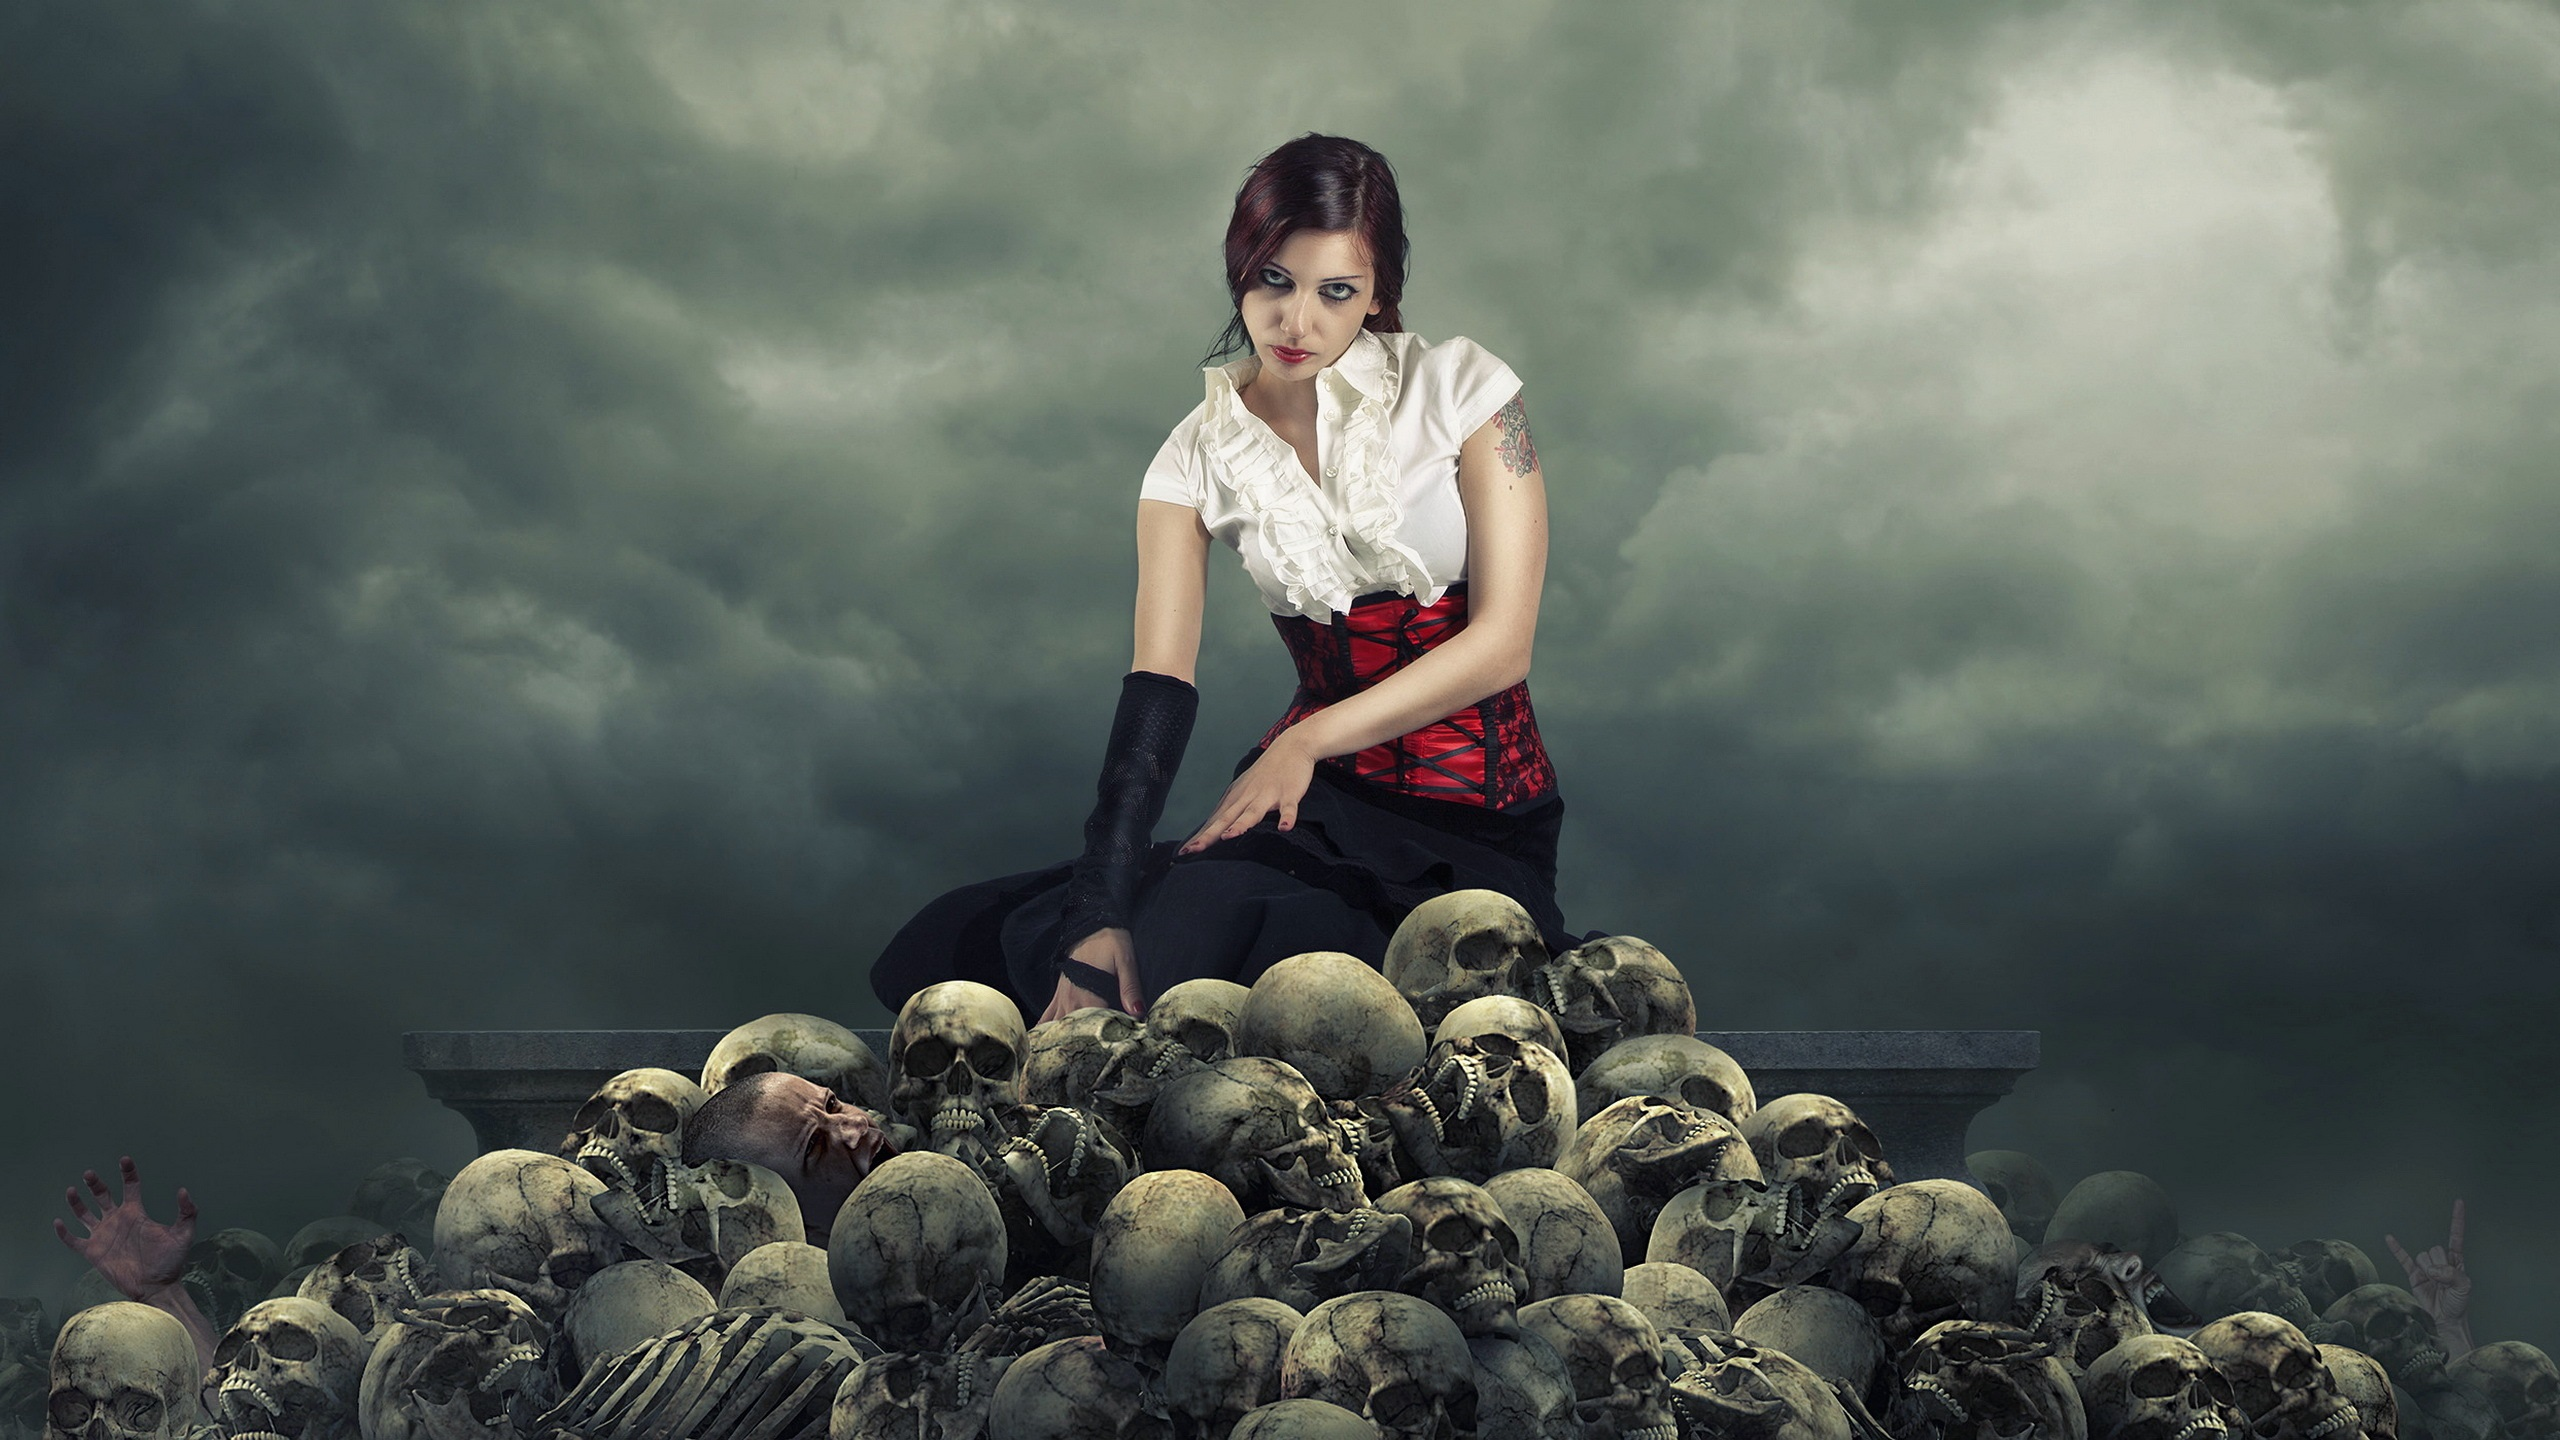 Wallpaper Creative pictures, girl, skull 2560x1440 QHD